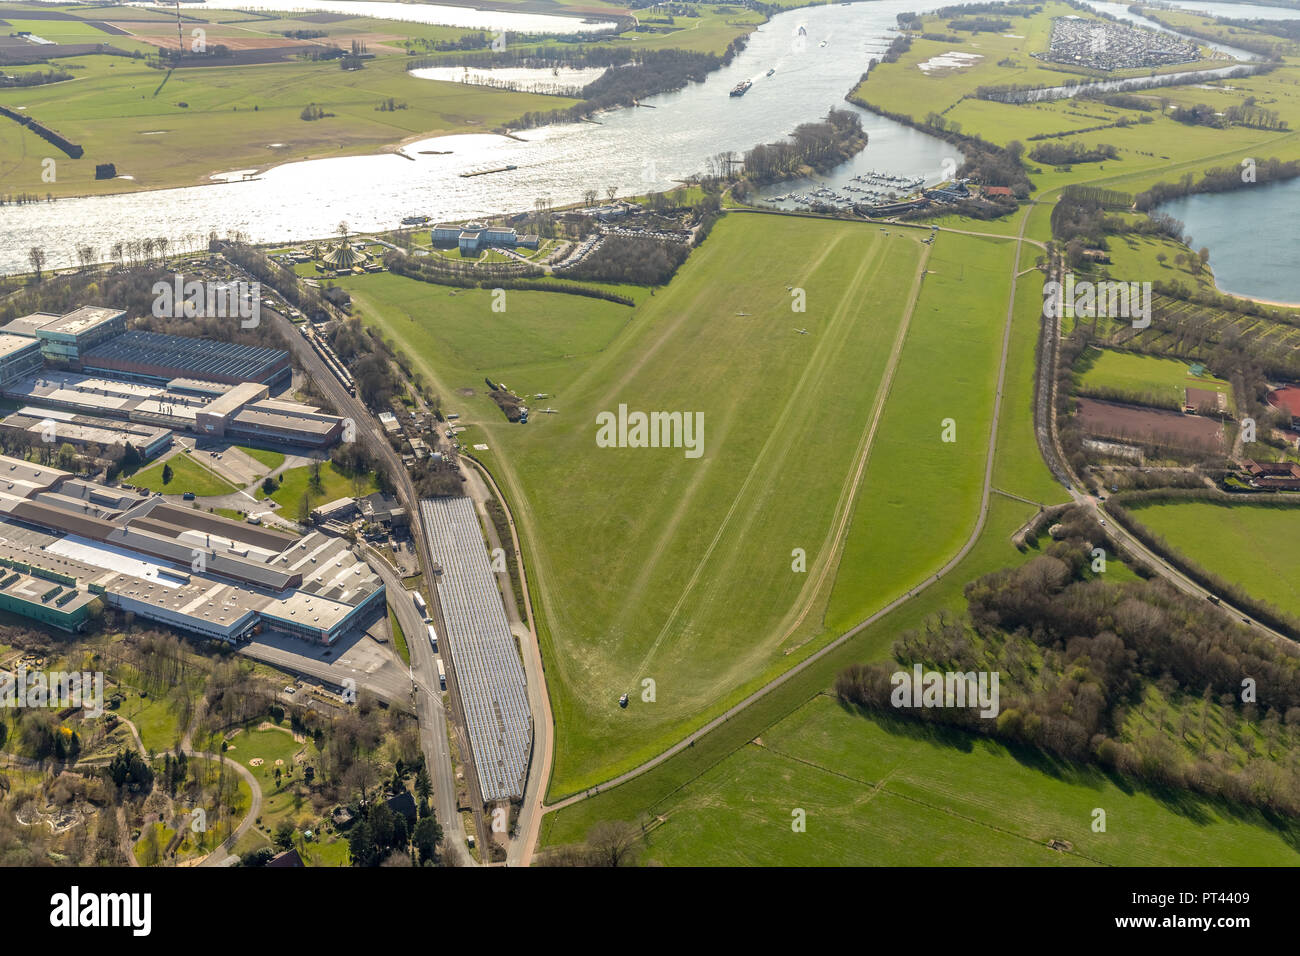 Aerodrome Wesel-Römerwardt, Gliding Grounds, General Aviation, Wesel, Rhineland, Hanseatic City, Lower Rhine, North Rhine-Westphalia, Germany - Stock Image